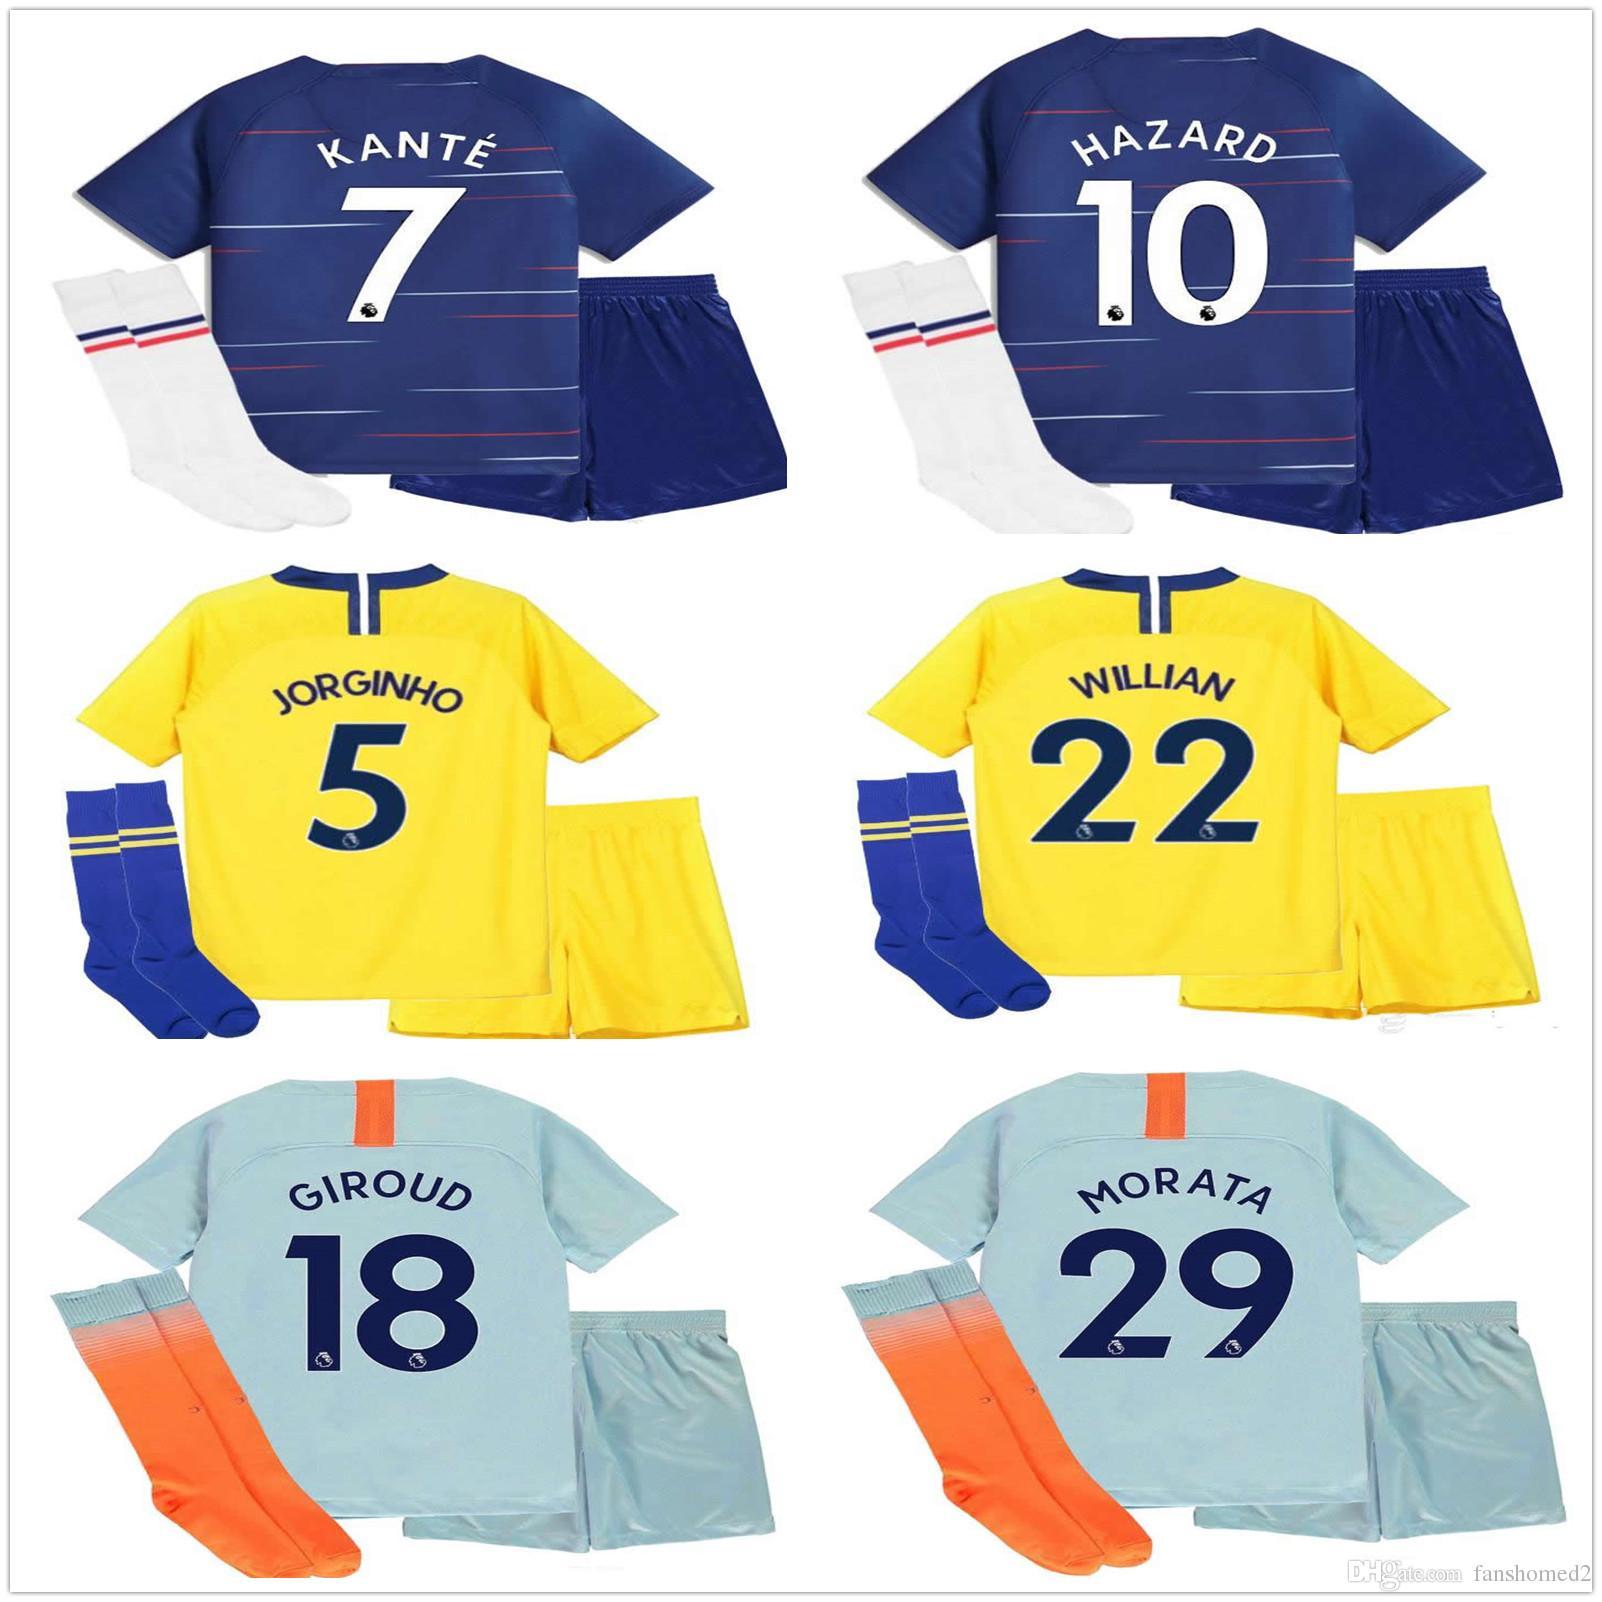 Compre 2018 PELIGRO 2019 Juegos De Fútbol Para Niños 18 19 MARCOS ALONSO  MORATA Kit Para Niños GIROUD KOVACIC Uniforme De Fútbol Para Niños Juegos  De Fútbol ... d0fc1d9dcd1c8